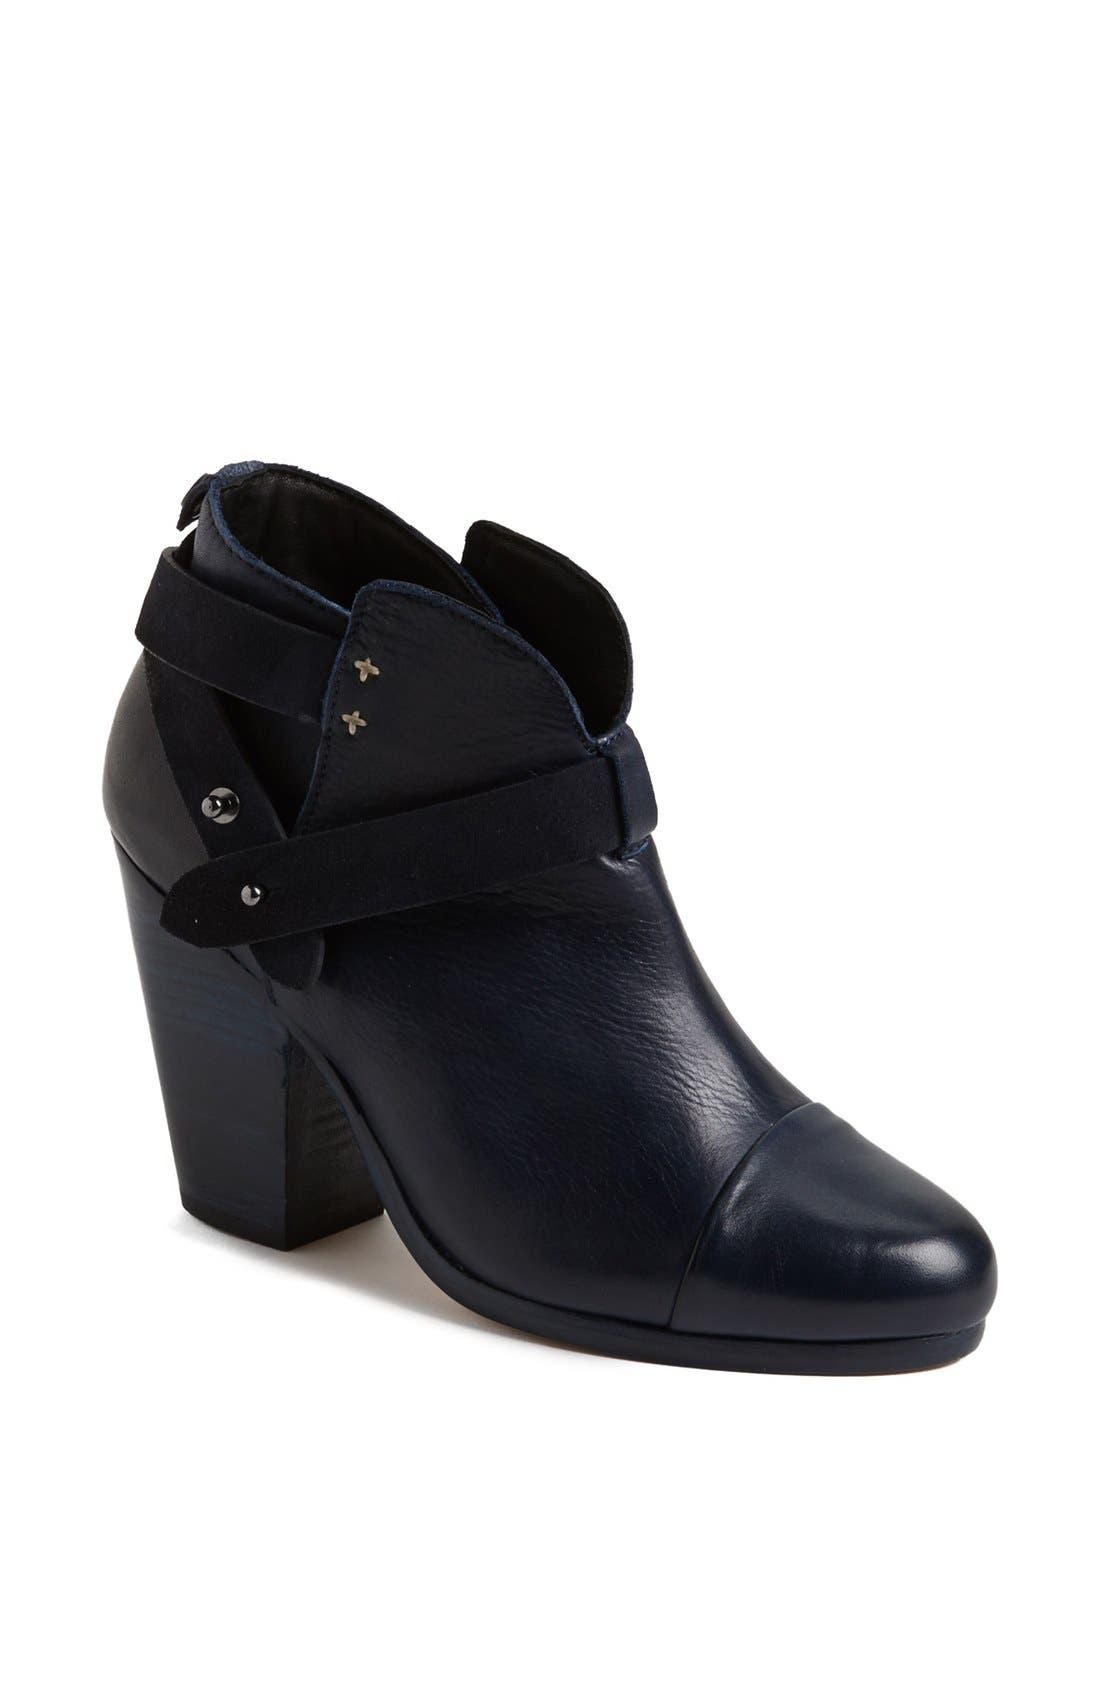 Main Image - rag & bone 'Harrow' Ankle Boot